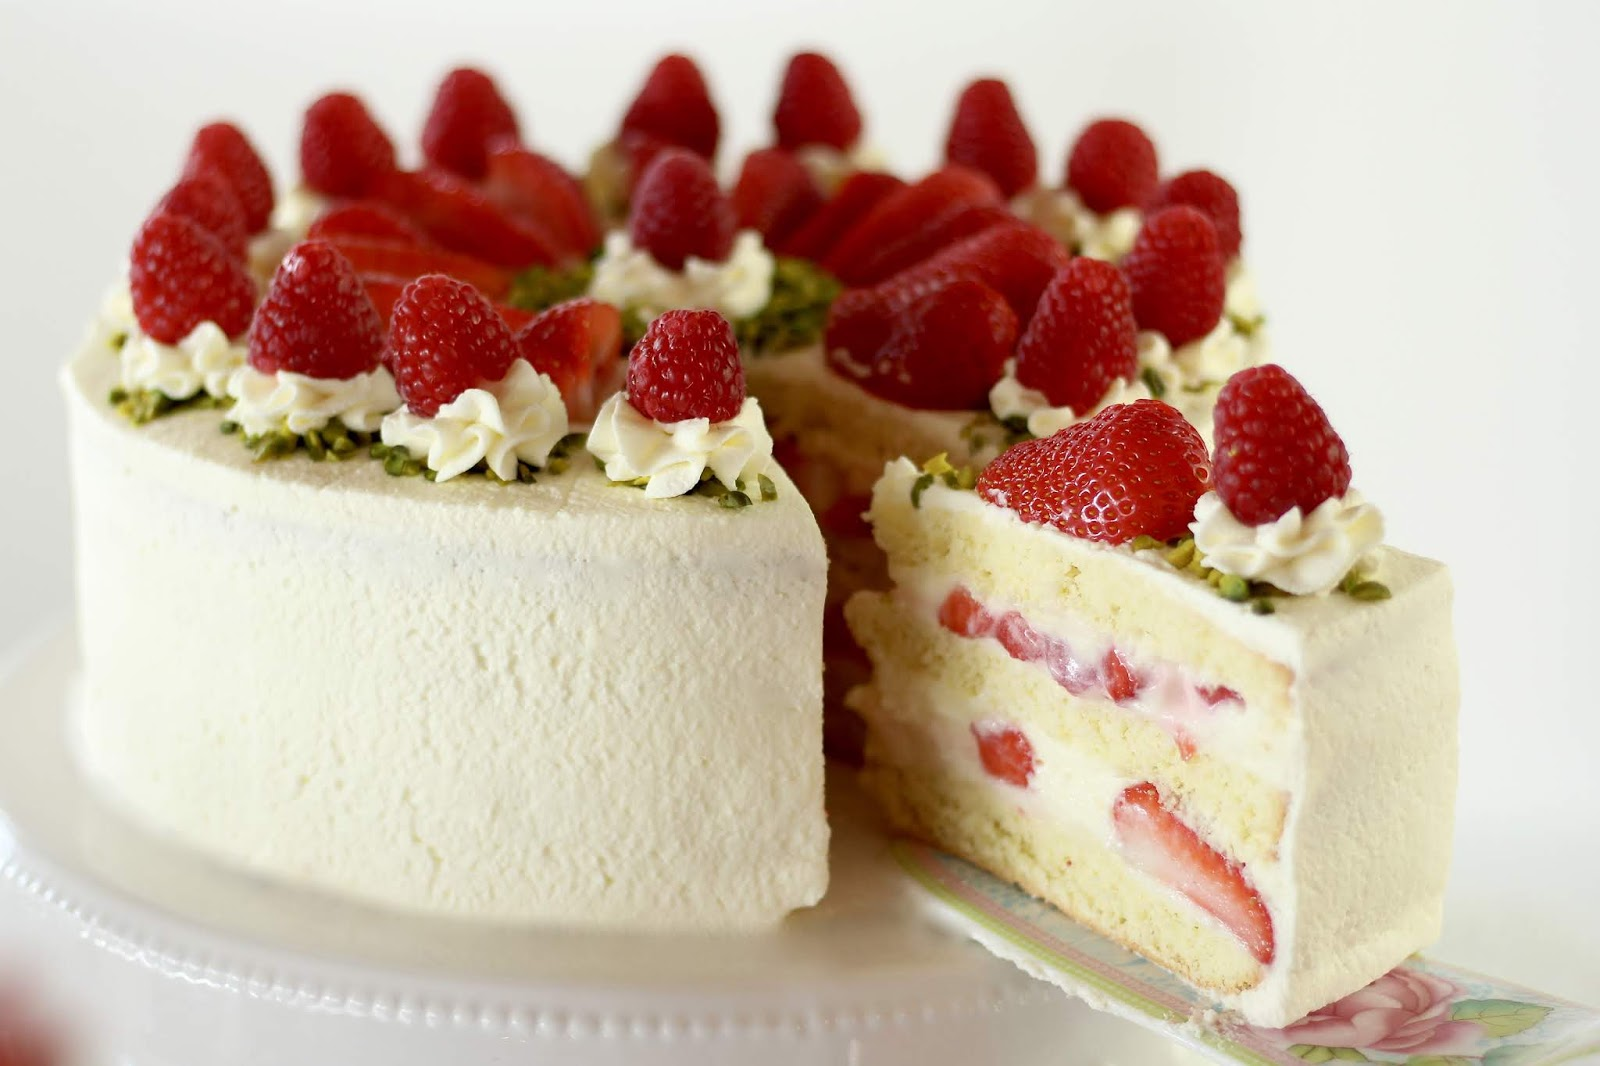 Erdbeer-Biskuit-Torte mit Joghurt-Mousse-au-Chocolat - Rezept und Videotutorial